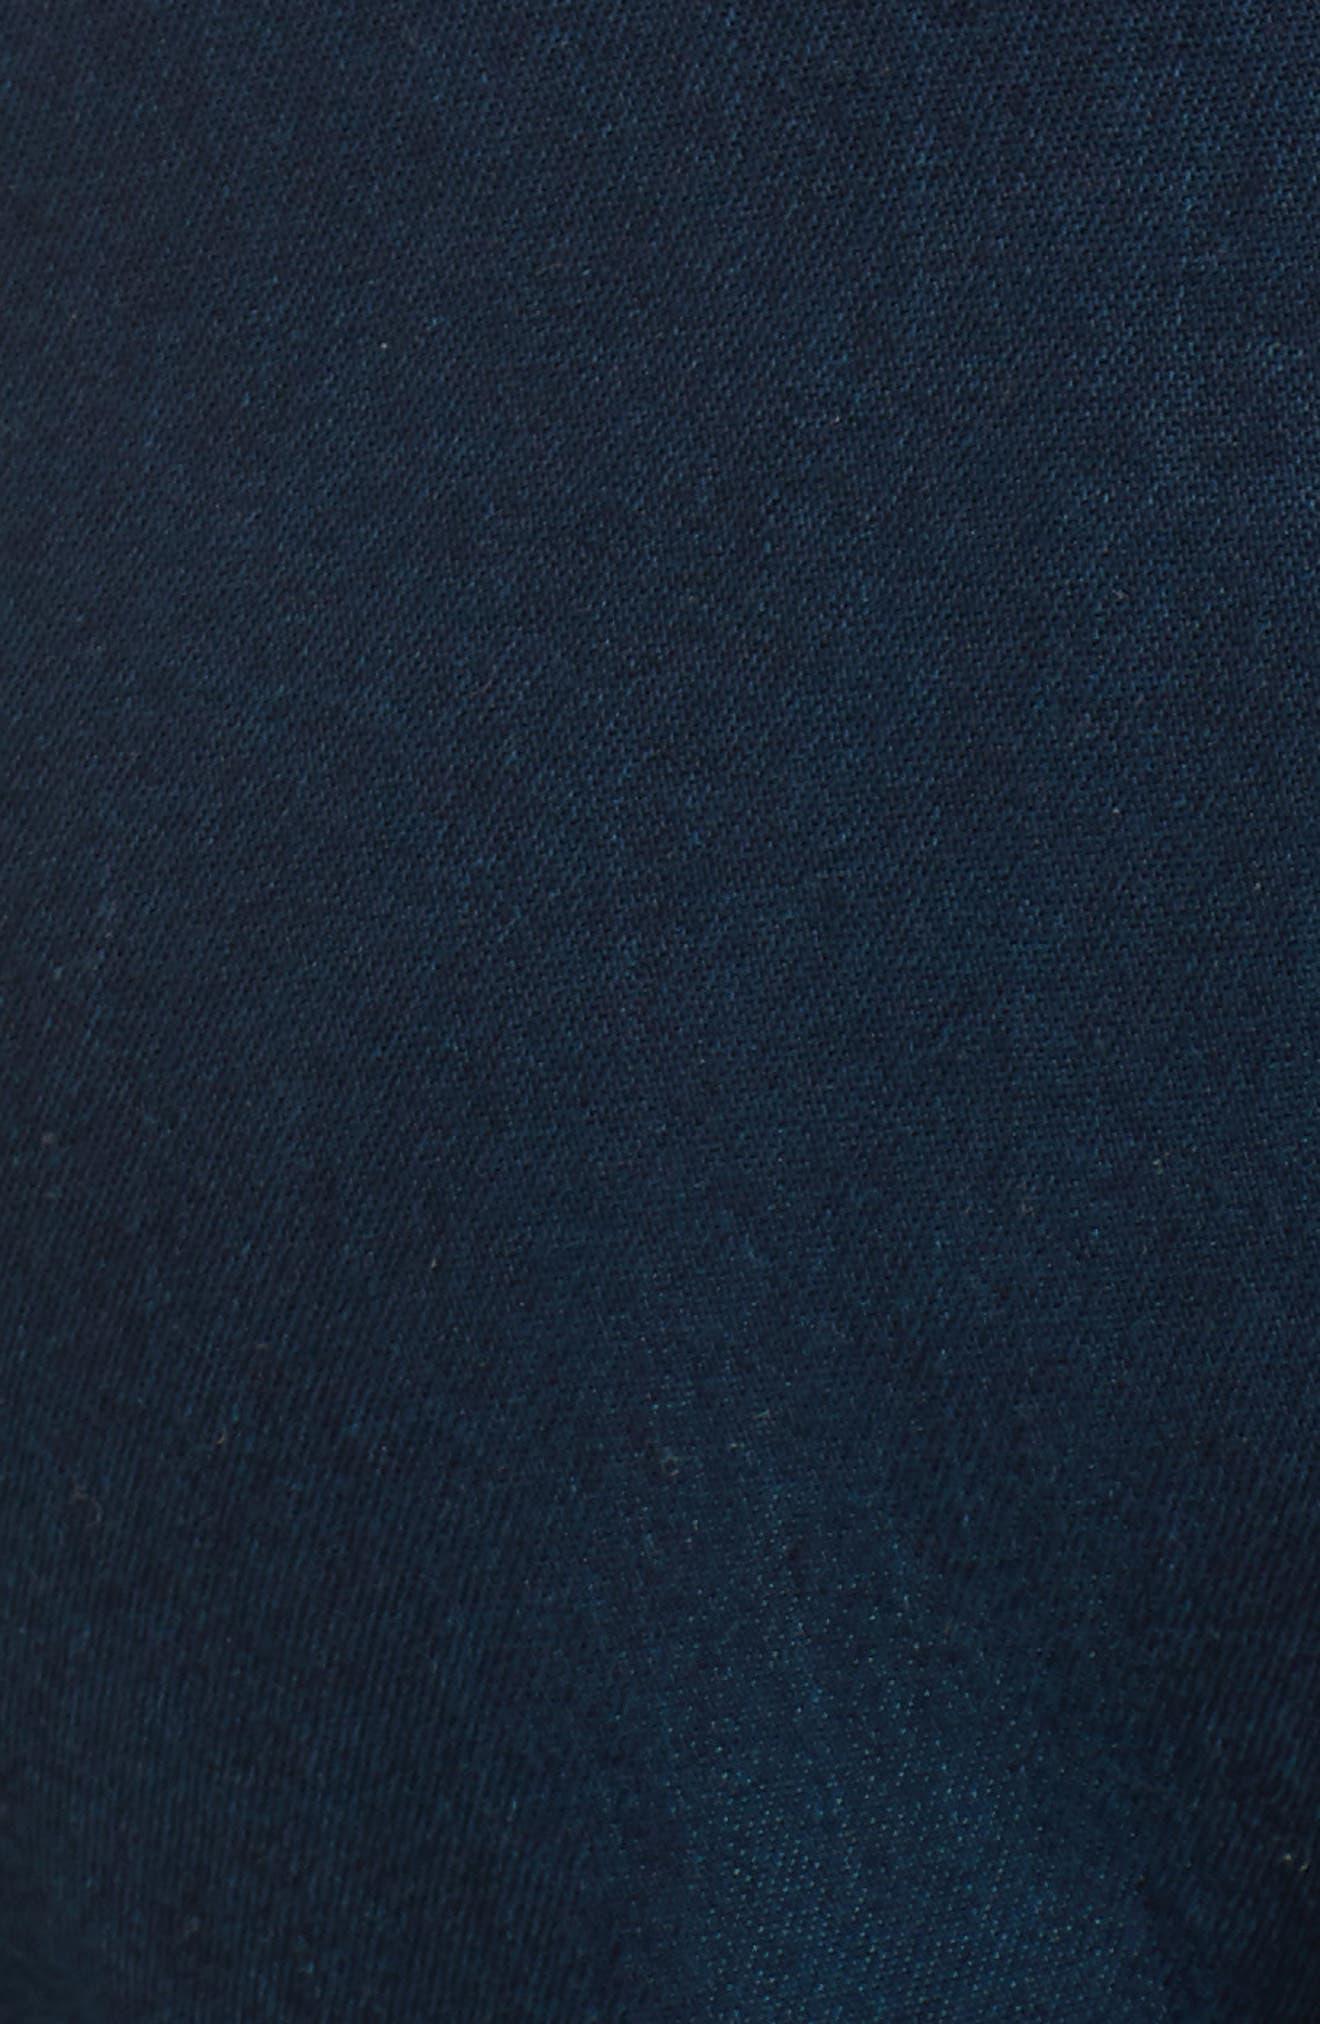 Elizabeth & Kenmare Shirtdress,                             Alternate thumbnail 5, color,